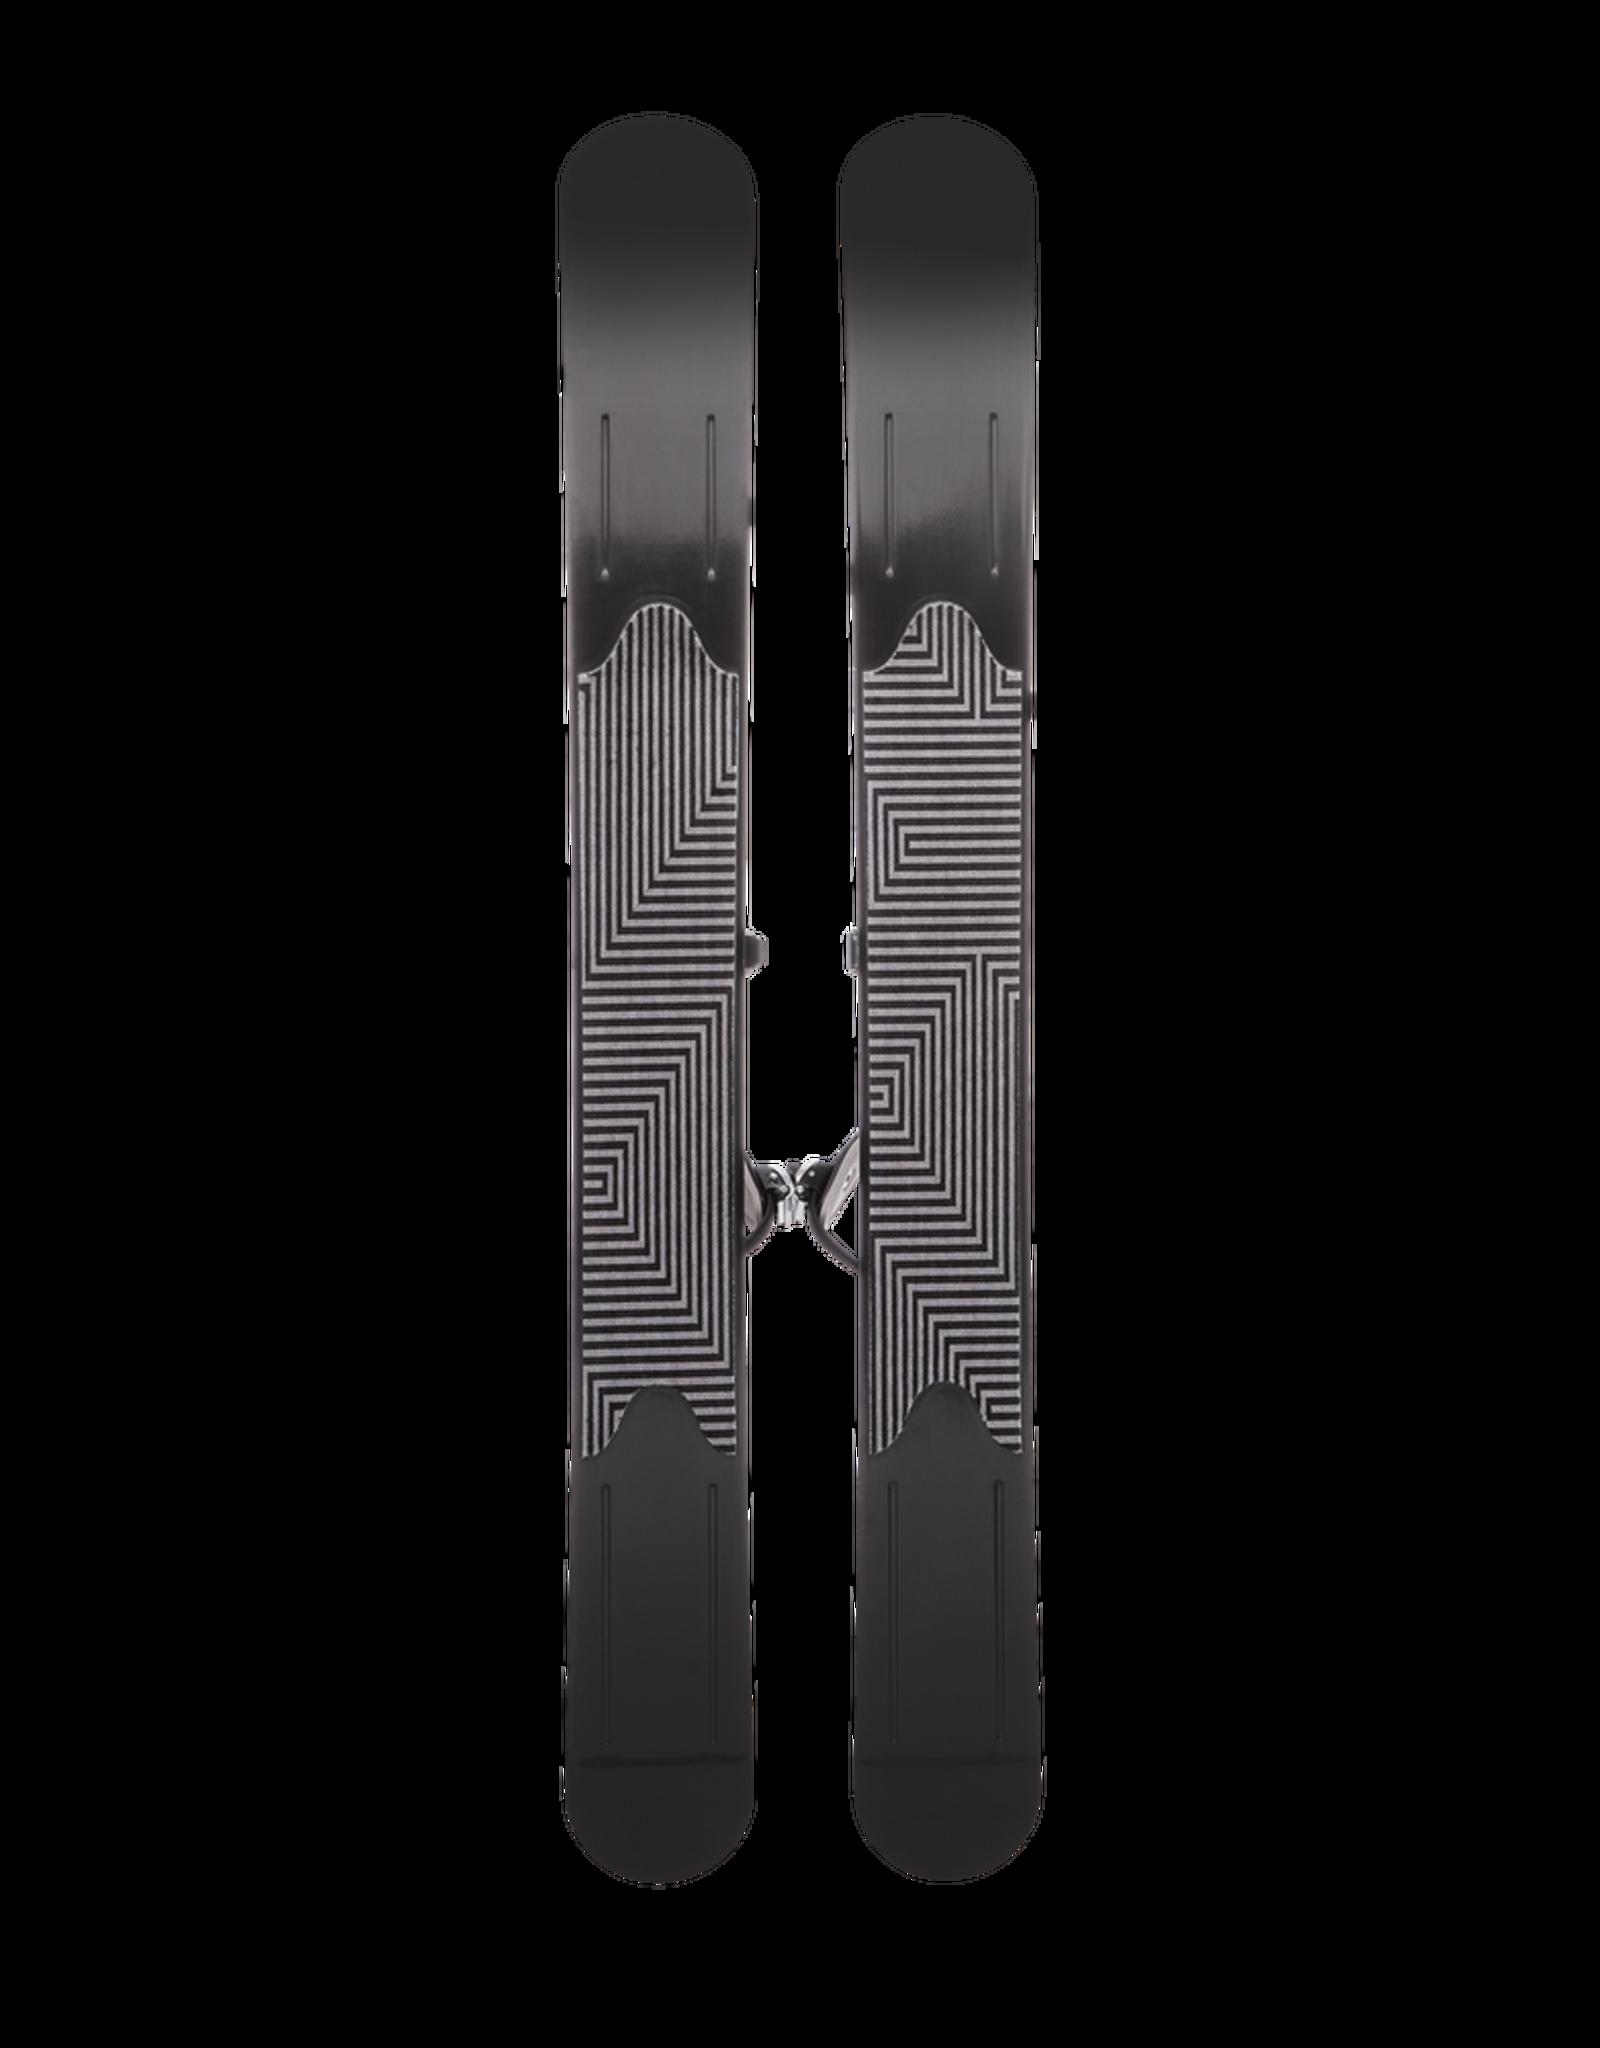 Black Diamond Black Diamond 2022 GlideLite 127 Trek Skis with Universal Bindings 147cm